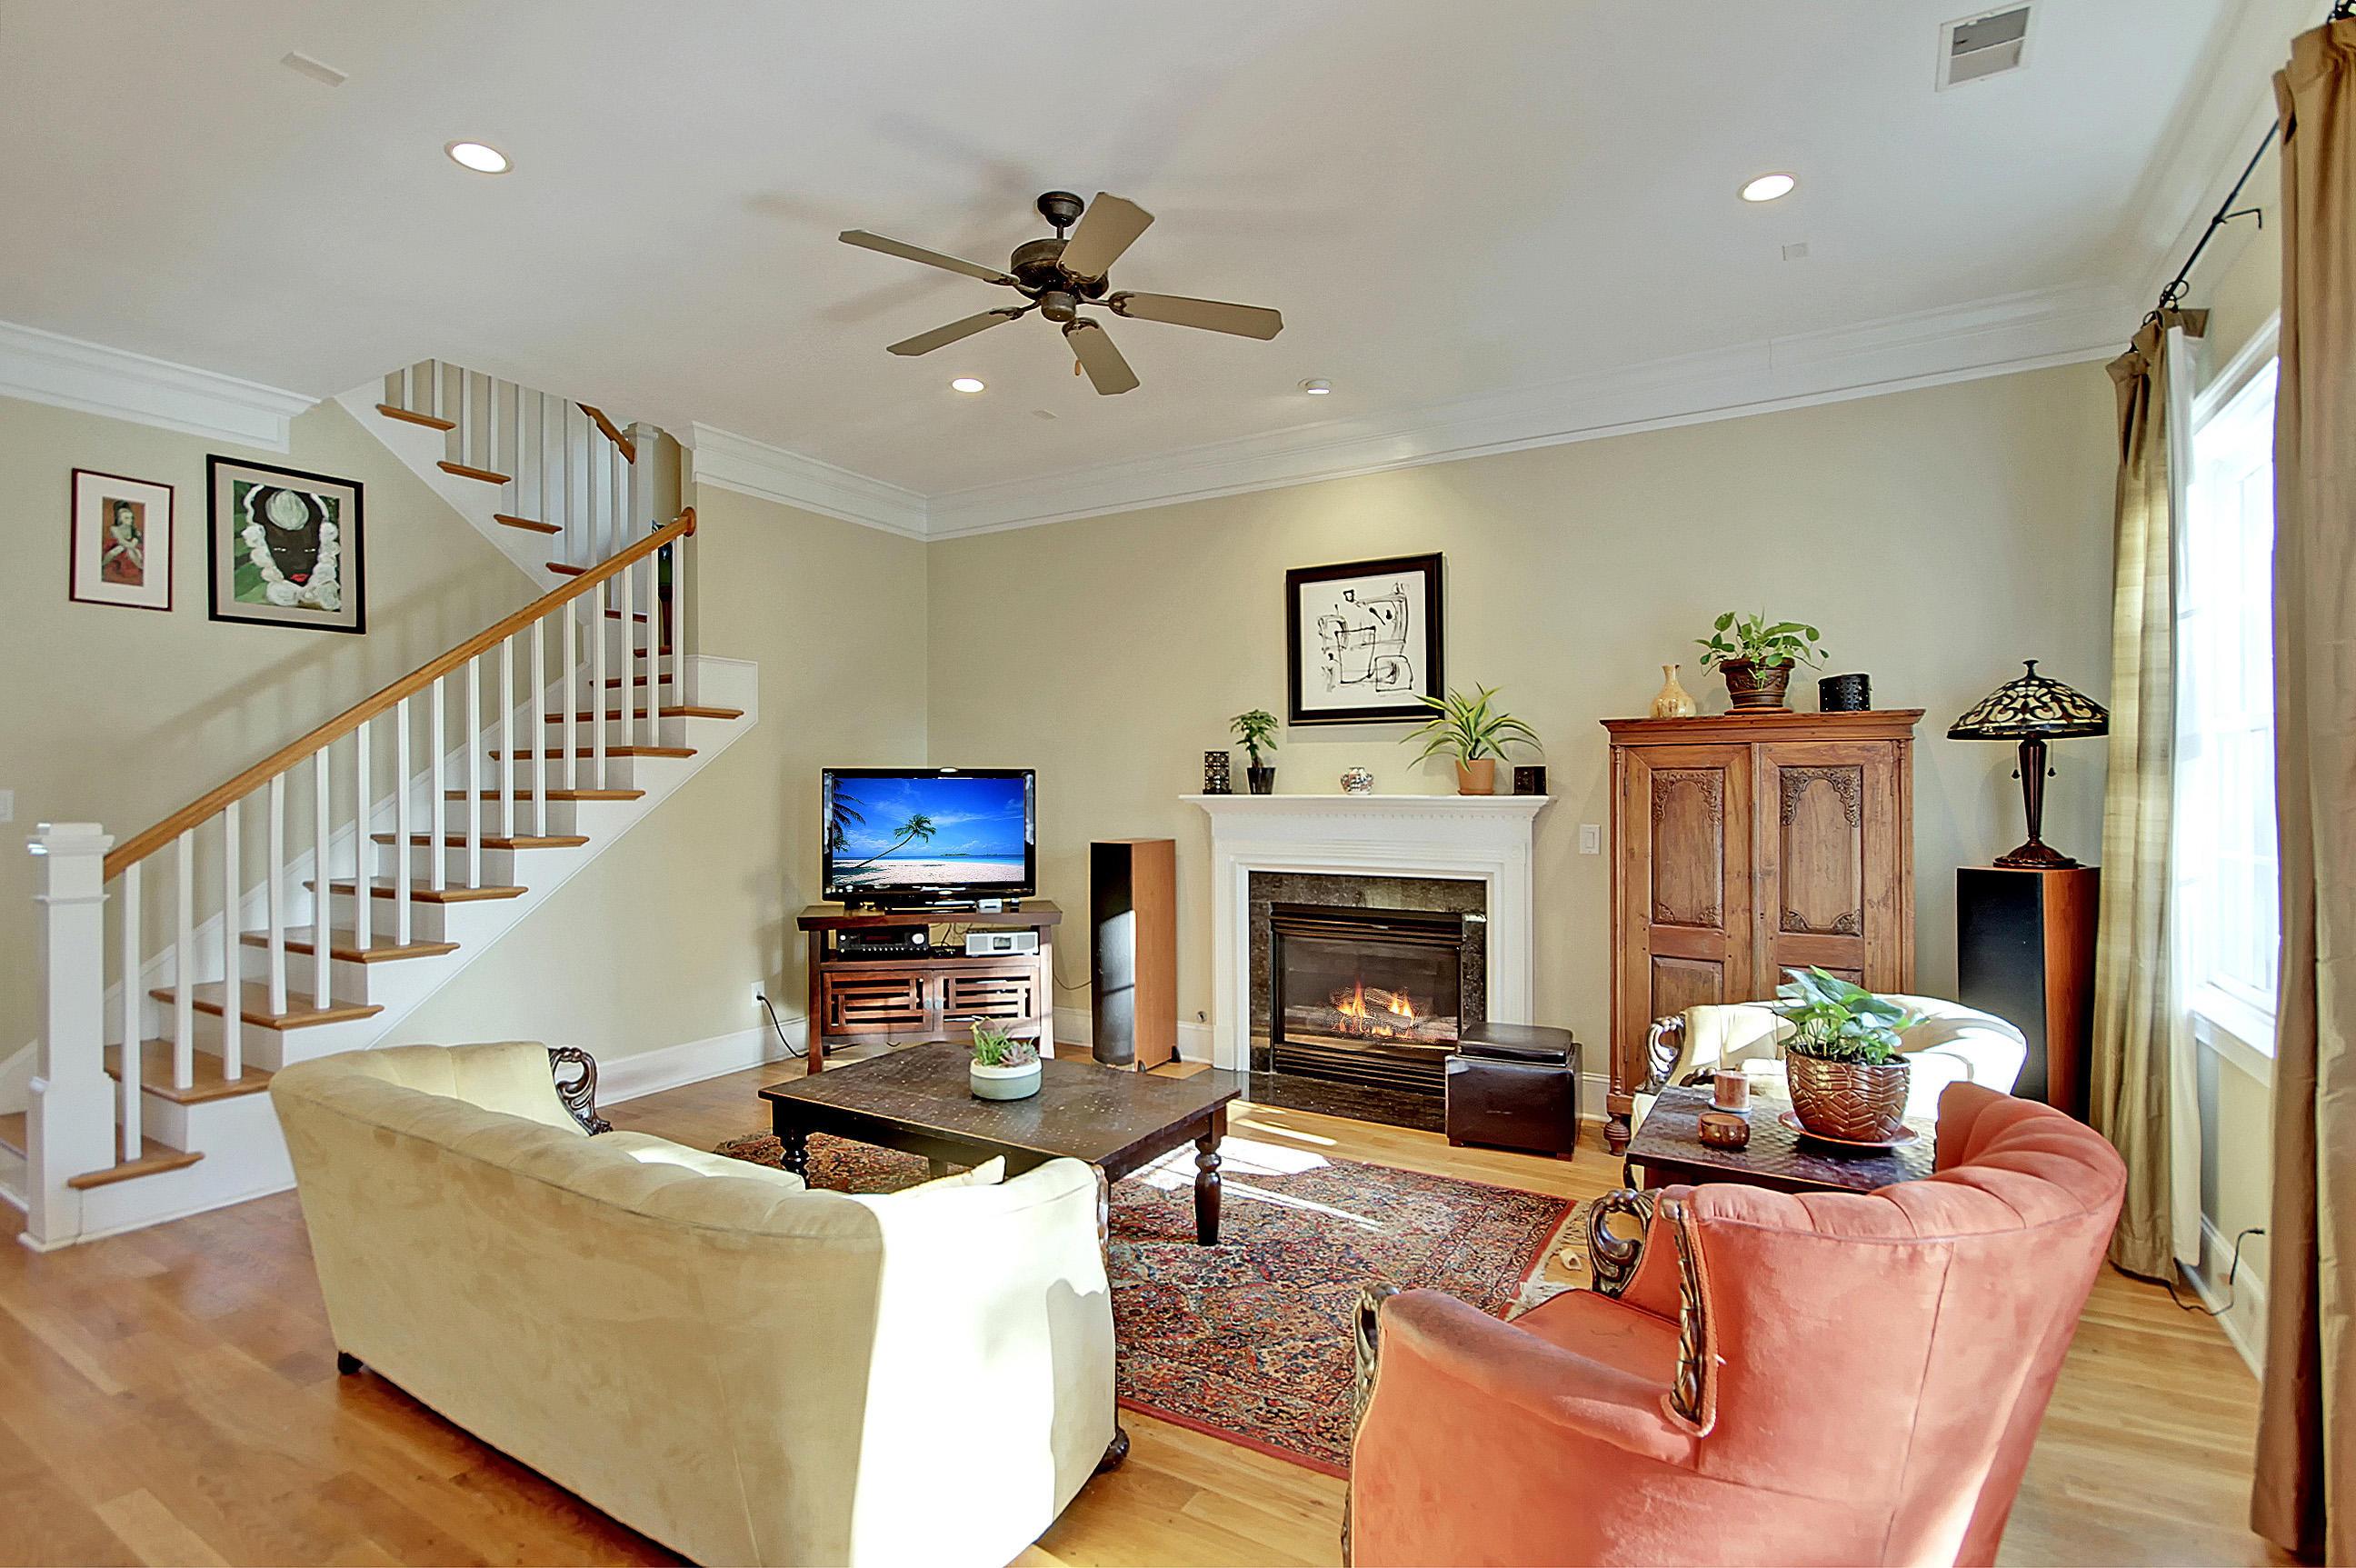 Cloudbreak Court Homes For Sale - 638 Cloudbreak, Charleston, SC - 21